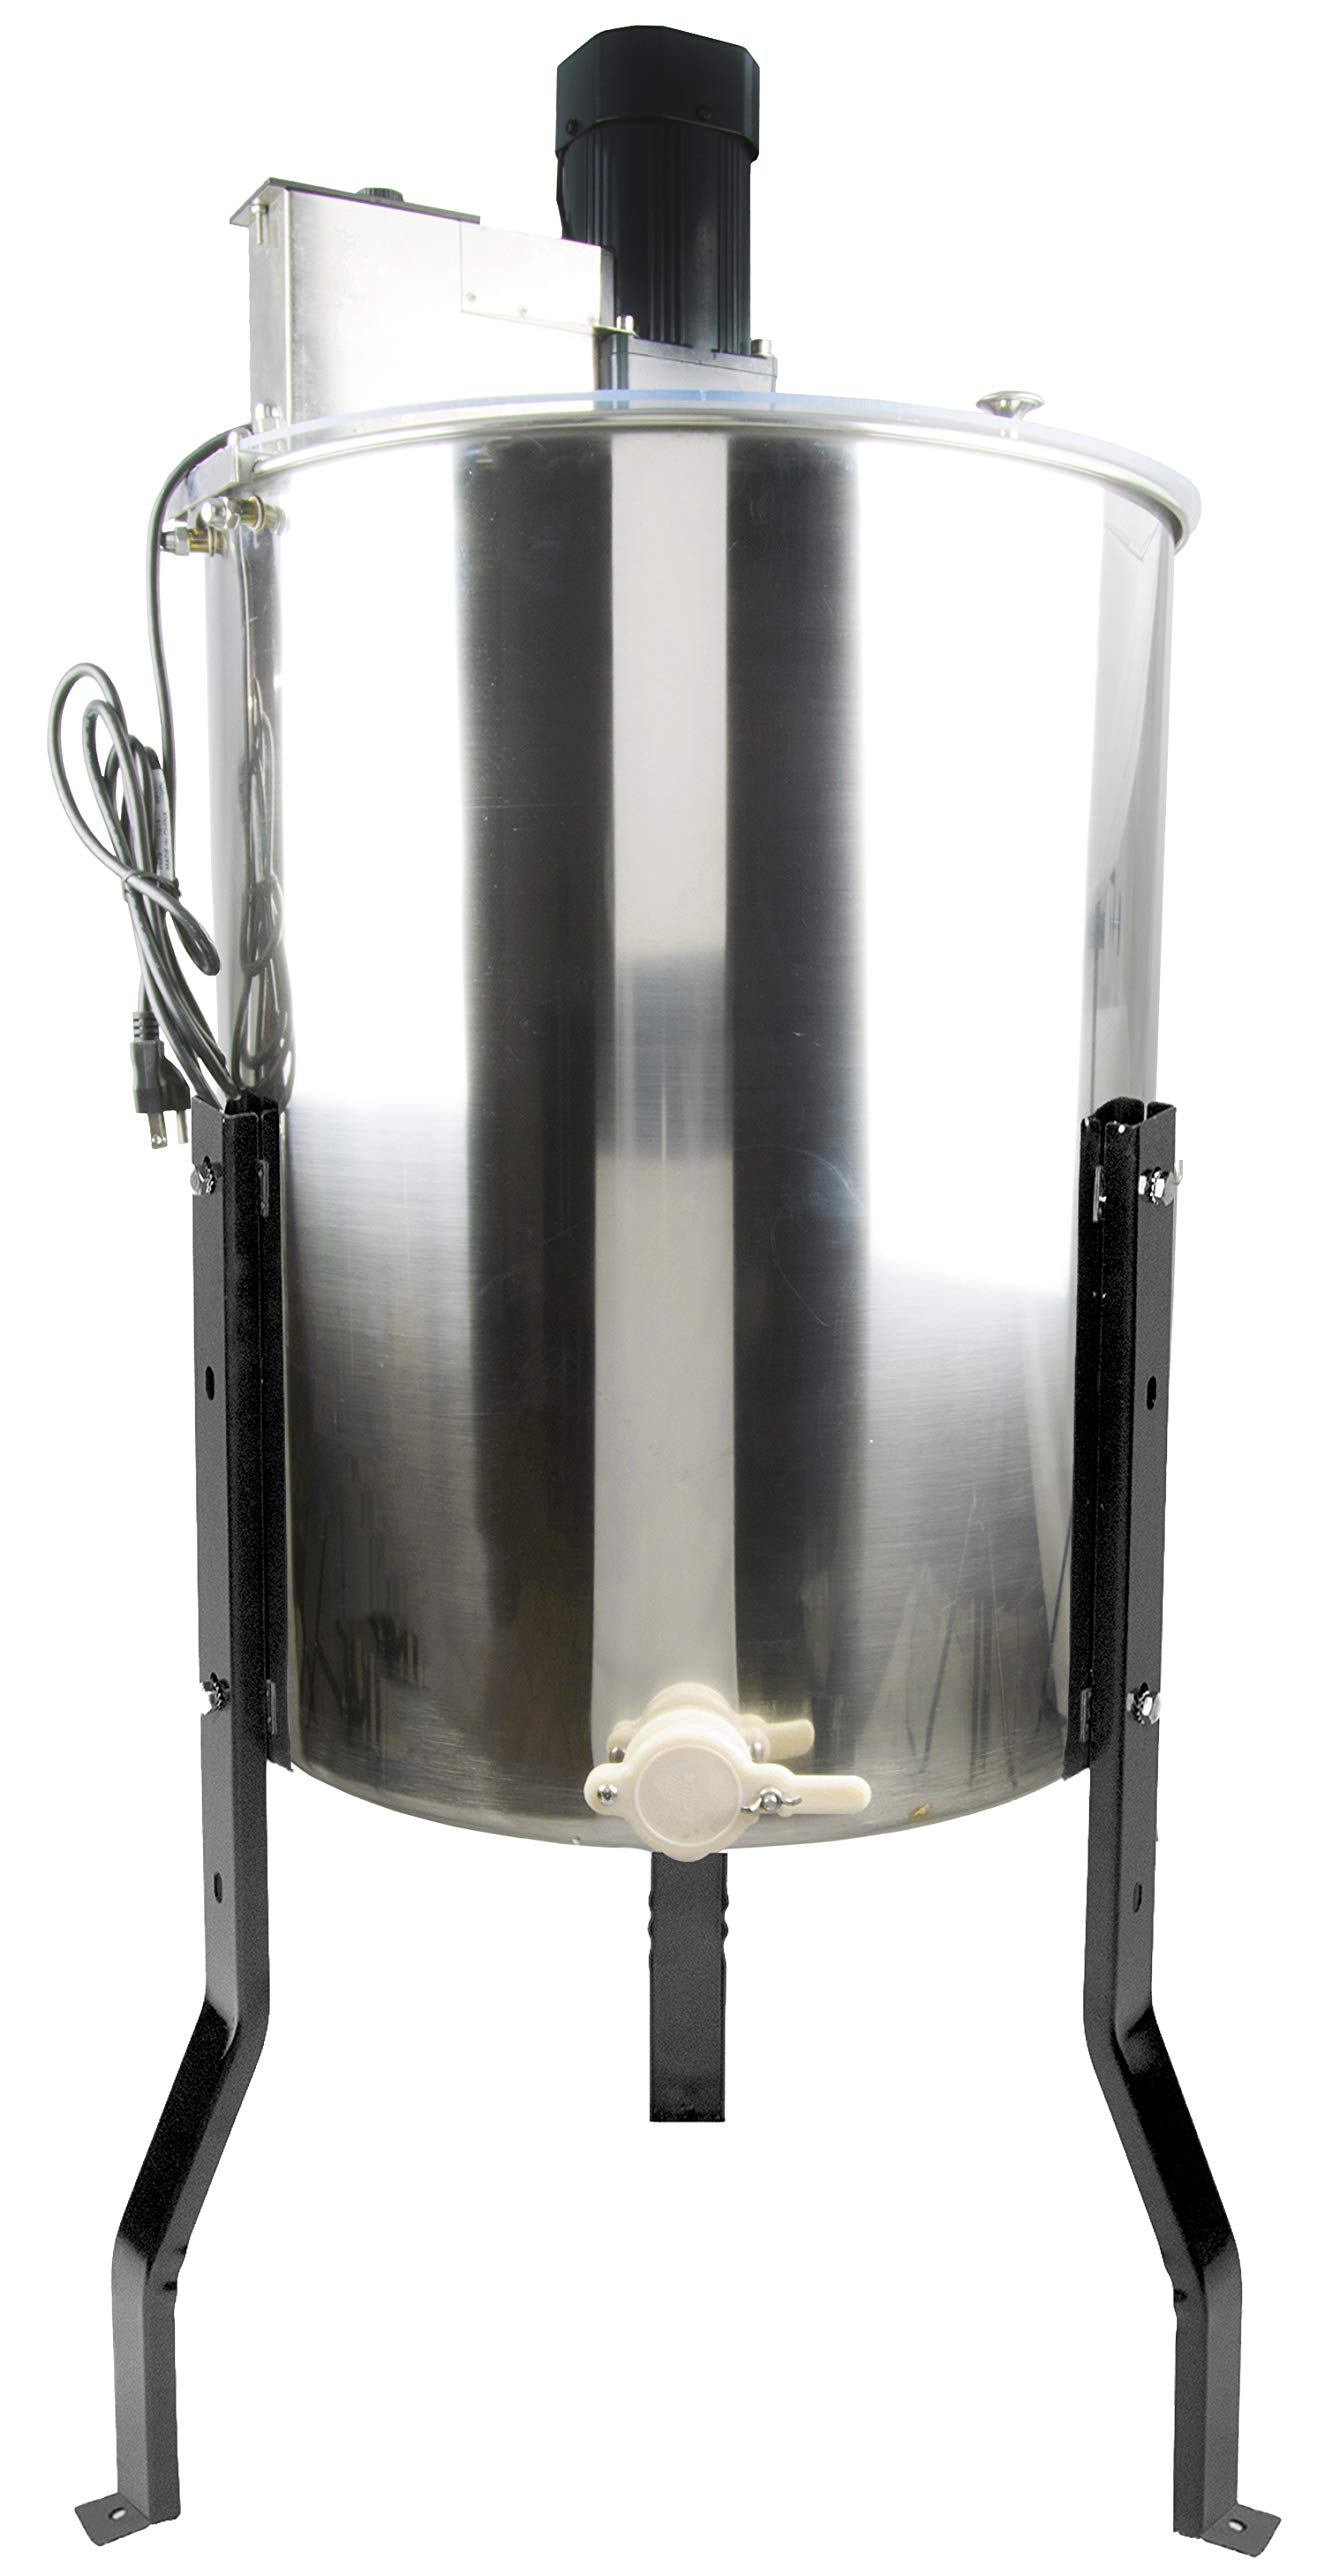 VIVO Electric 4 Frame Stainless Steel Honey Extractor | Honeycomb Drum Spinner (BEE-V004E) by VIVO